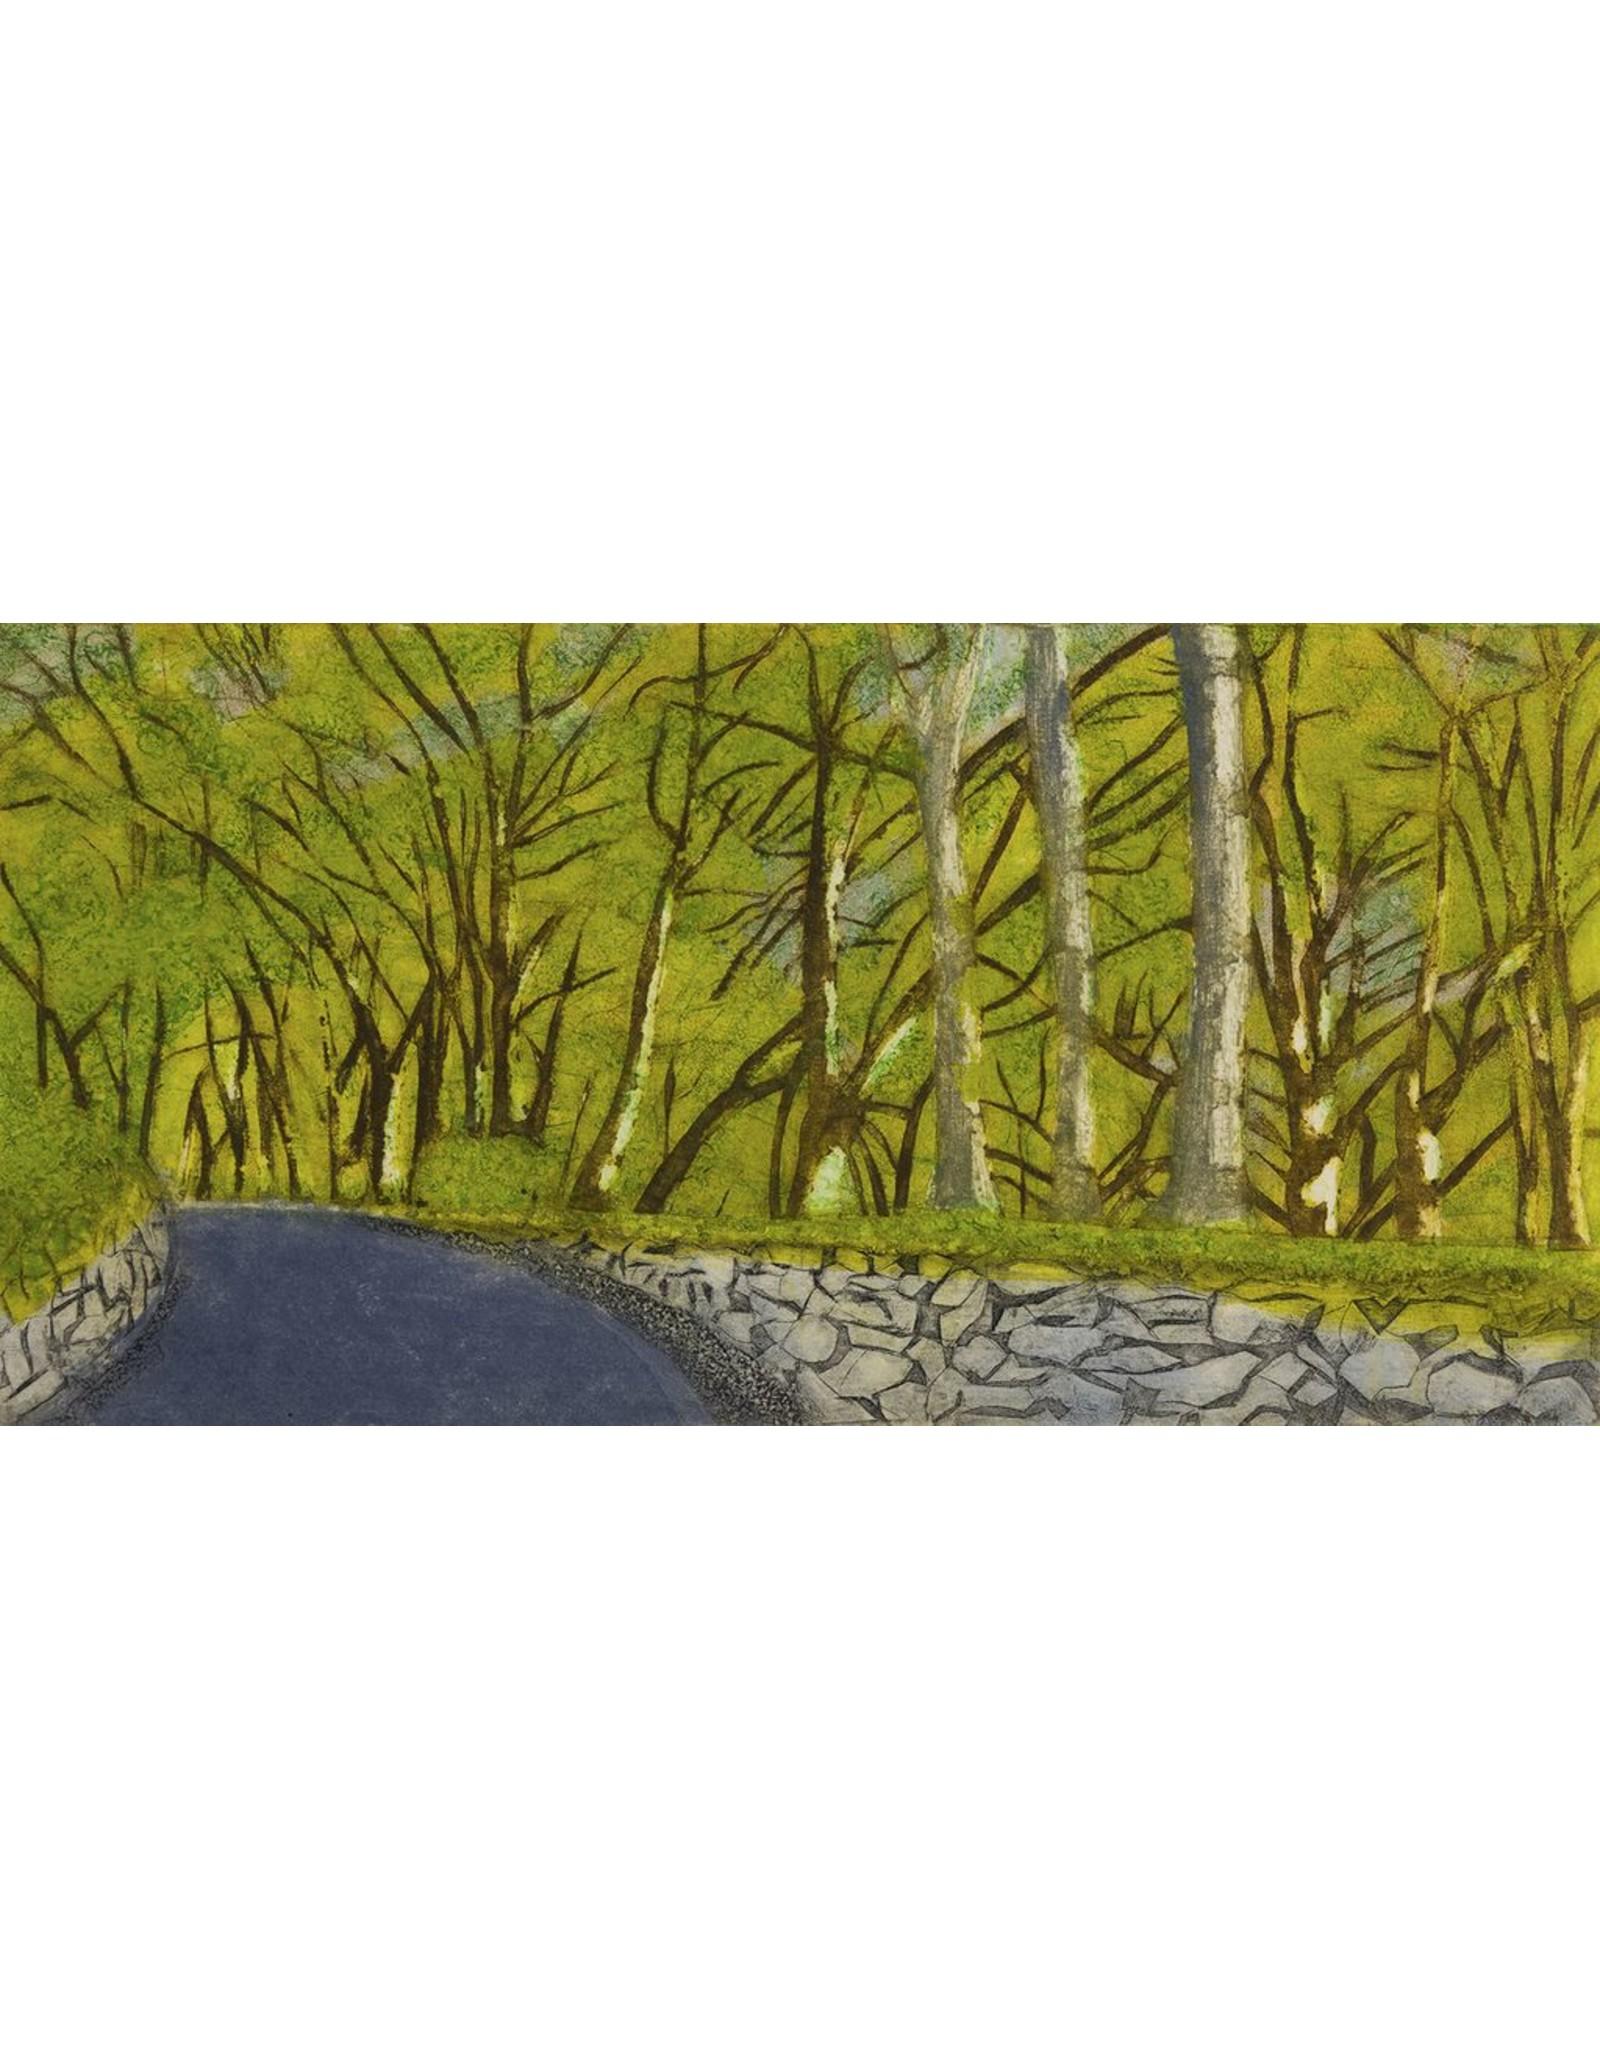 Crawford, Alice Road to Ballymena